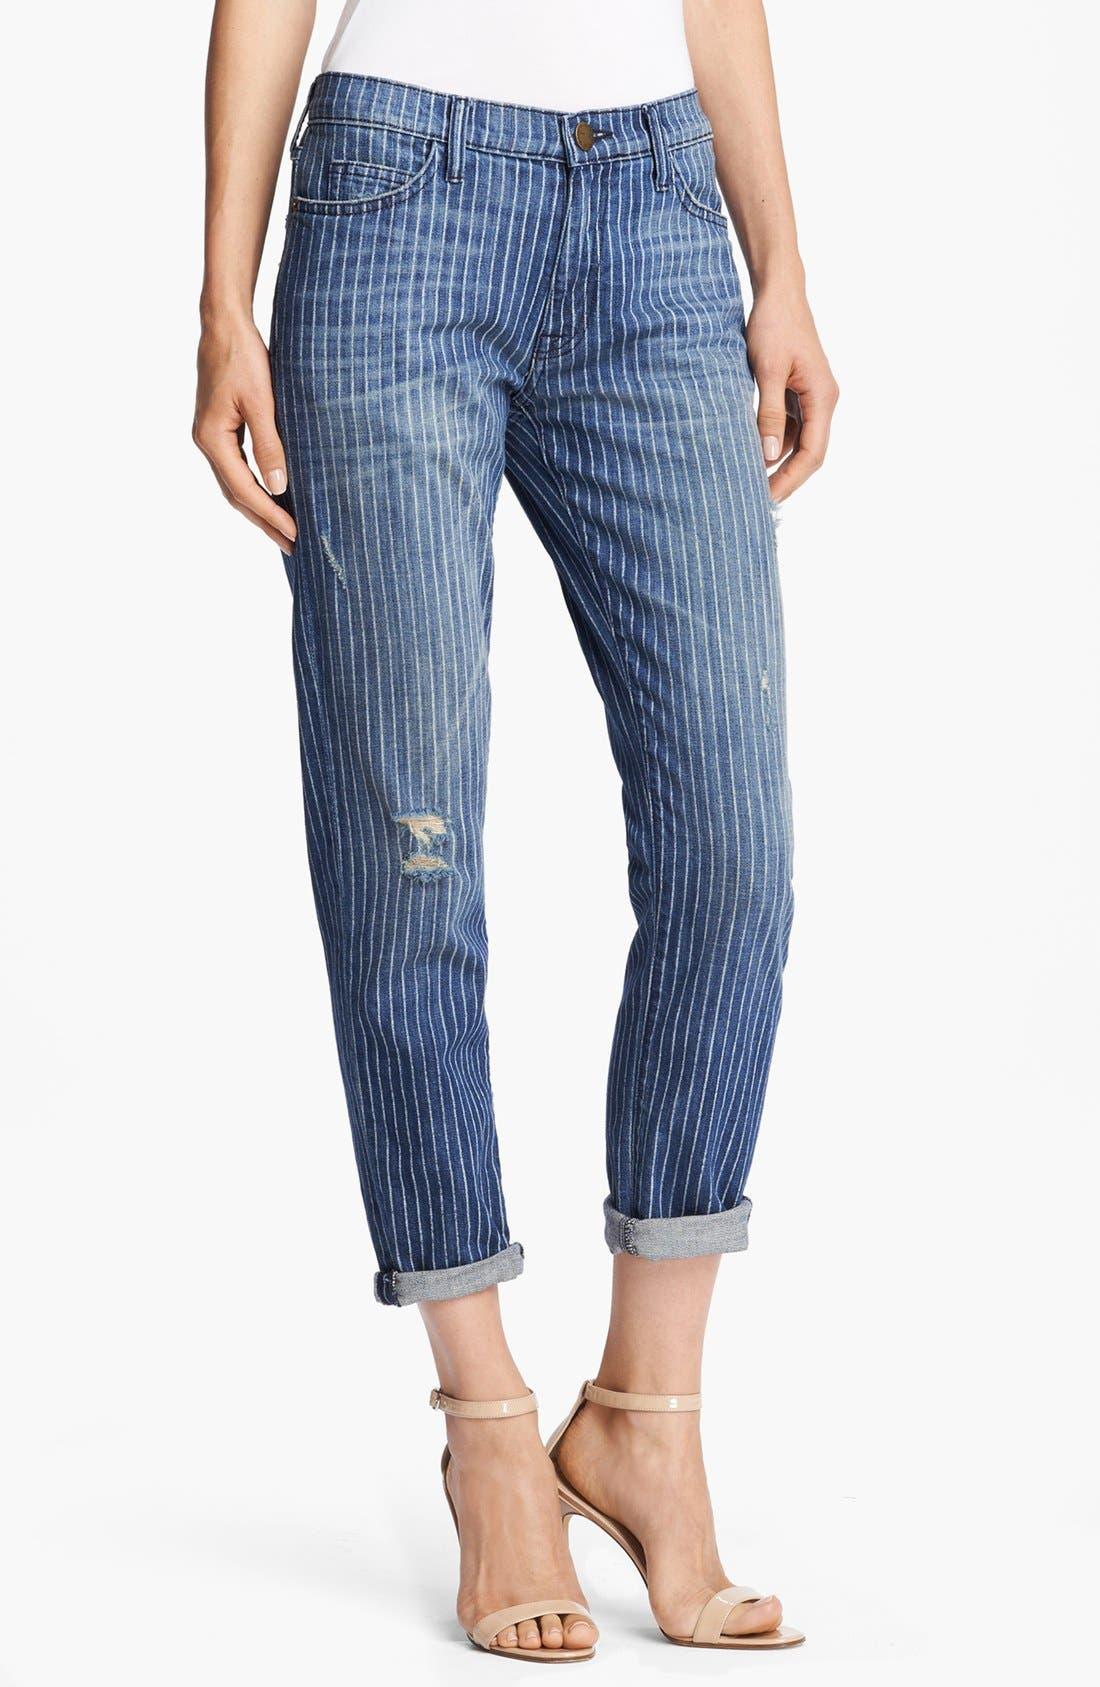 Alternate Image 1 Selected - Current/Elliott 'The Fling' Pinstripe Jeans